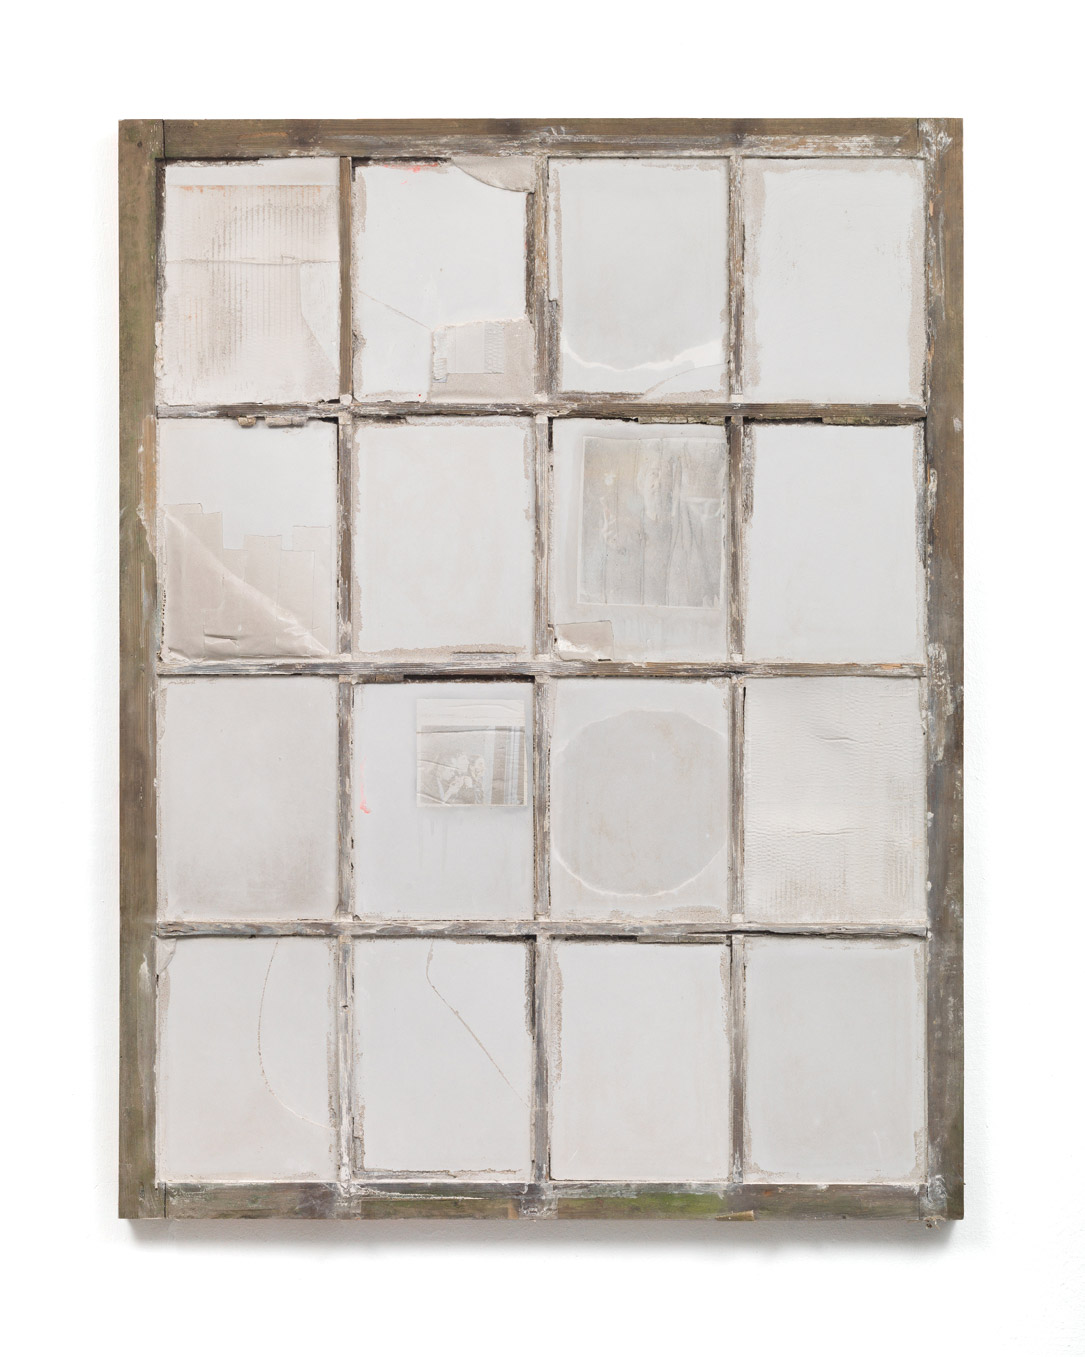 Anne Lina Billinger Fenster 2017 Concrete photo print wood 143x111x4 cm